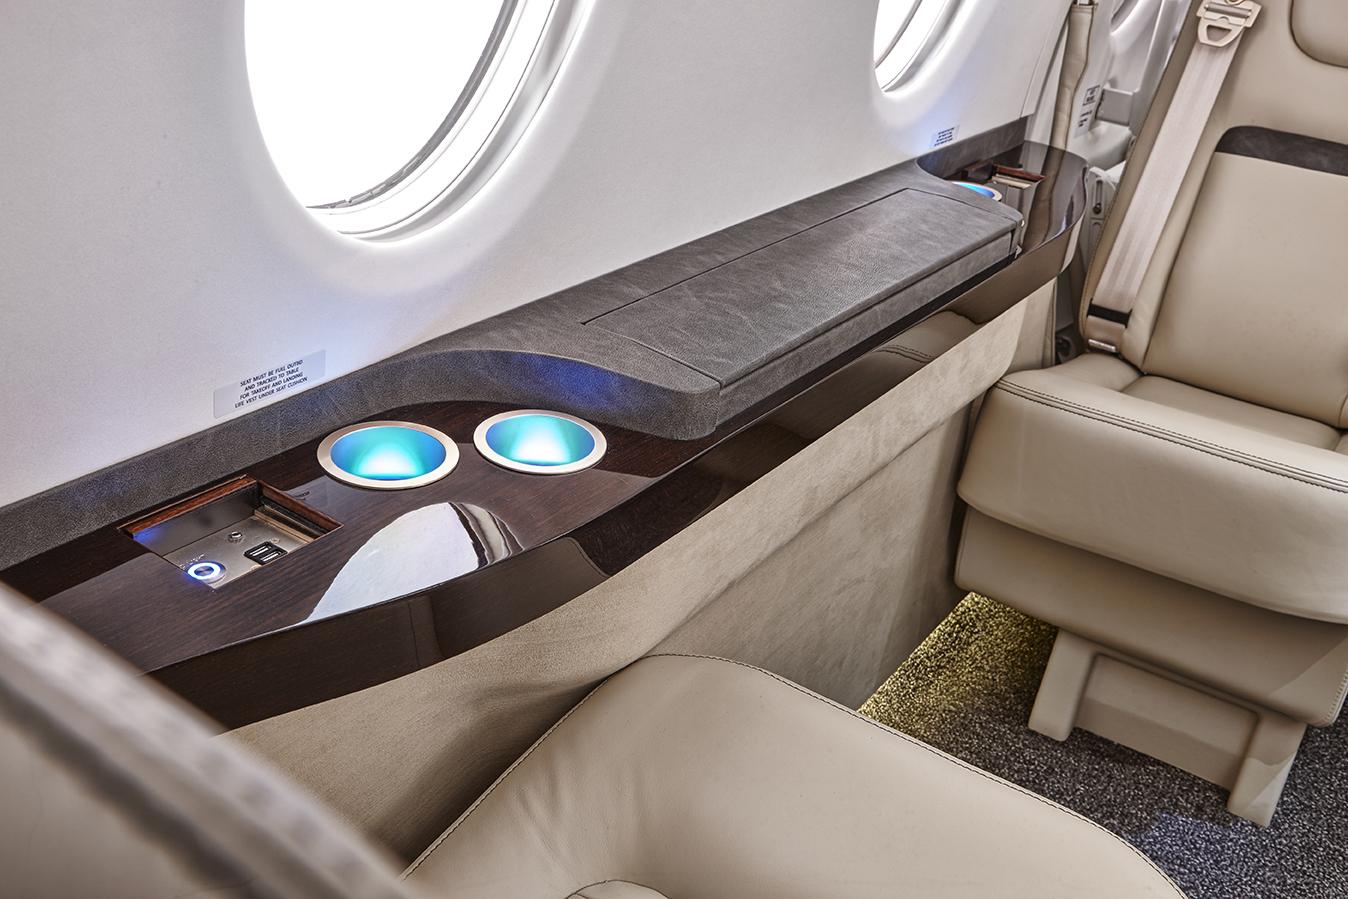 Hawker_400XP_Light-Jet_Legacy_Aviation_Private_Jet_NetJets_Jet_Charter_TEB_VNY_MIA_PBI_FRG_SFO_FLL_FXE_BED.png